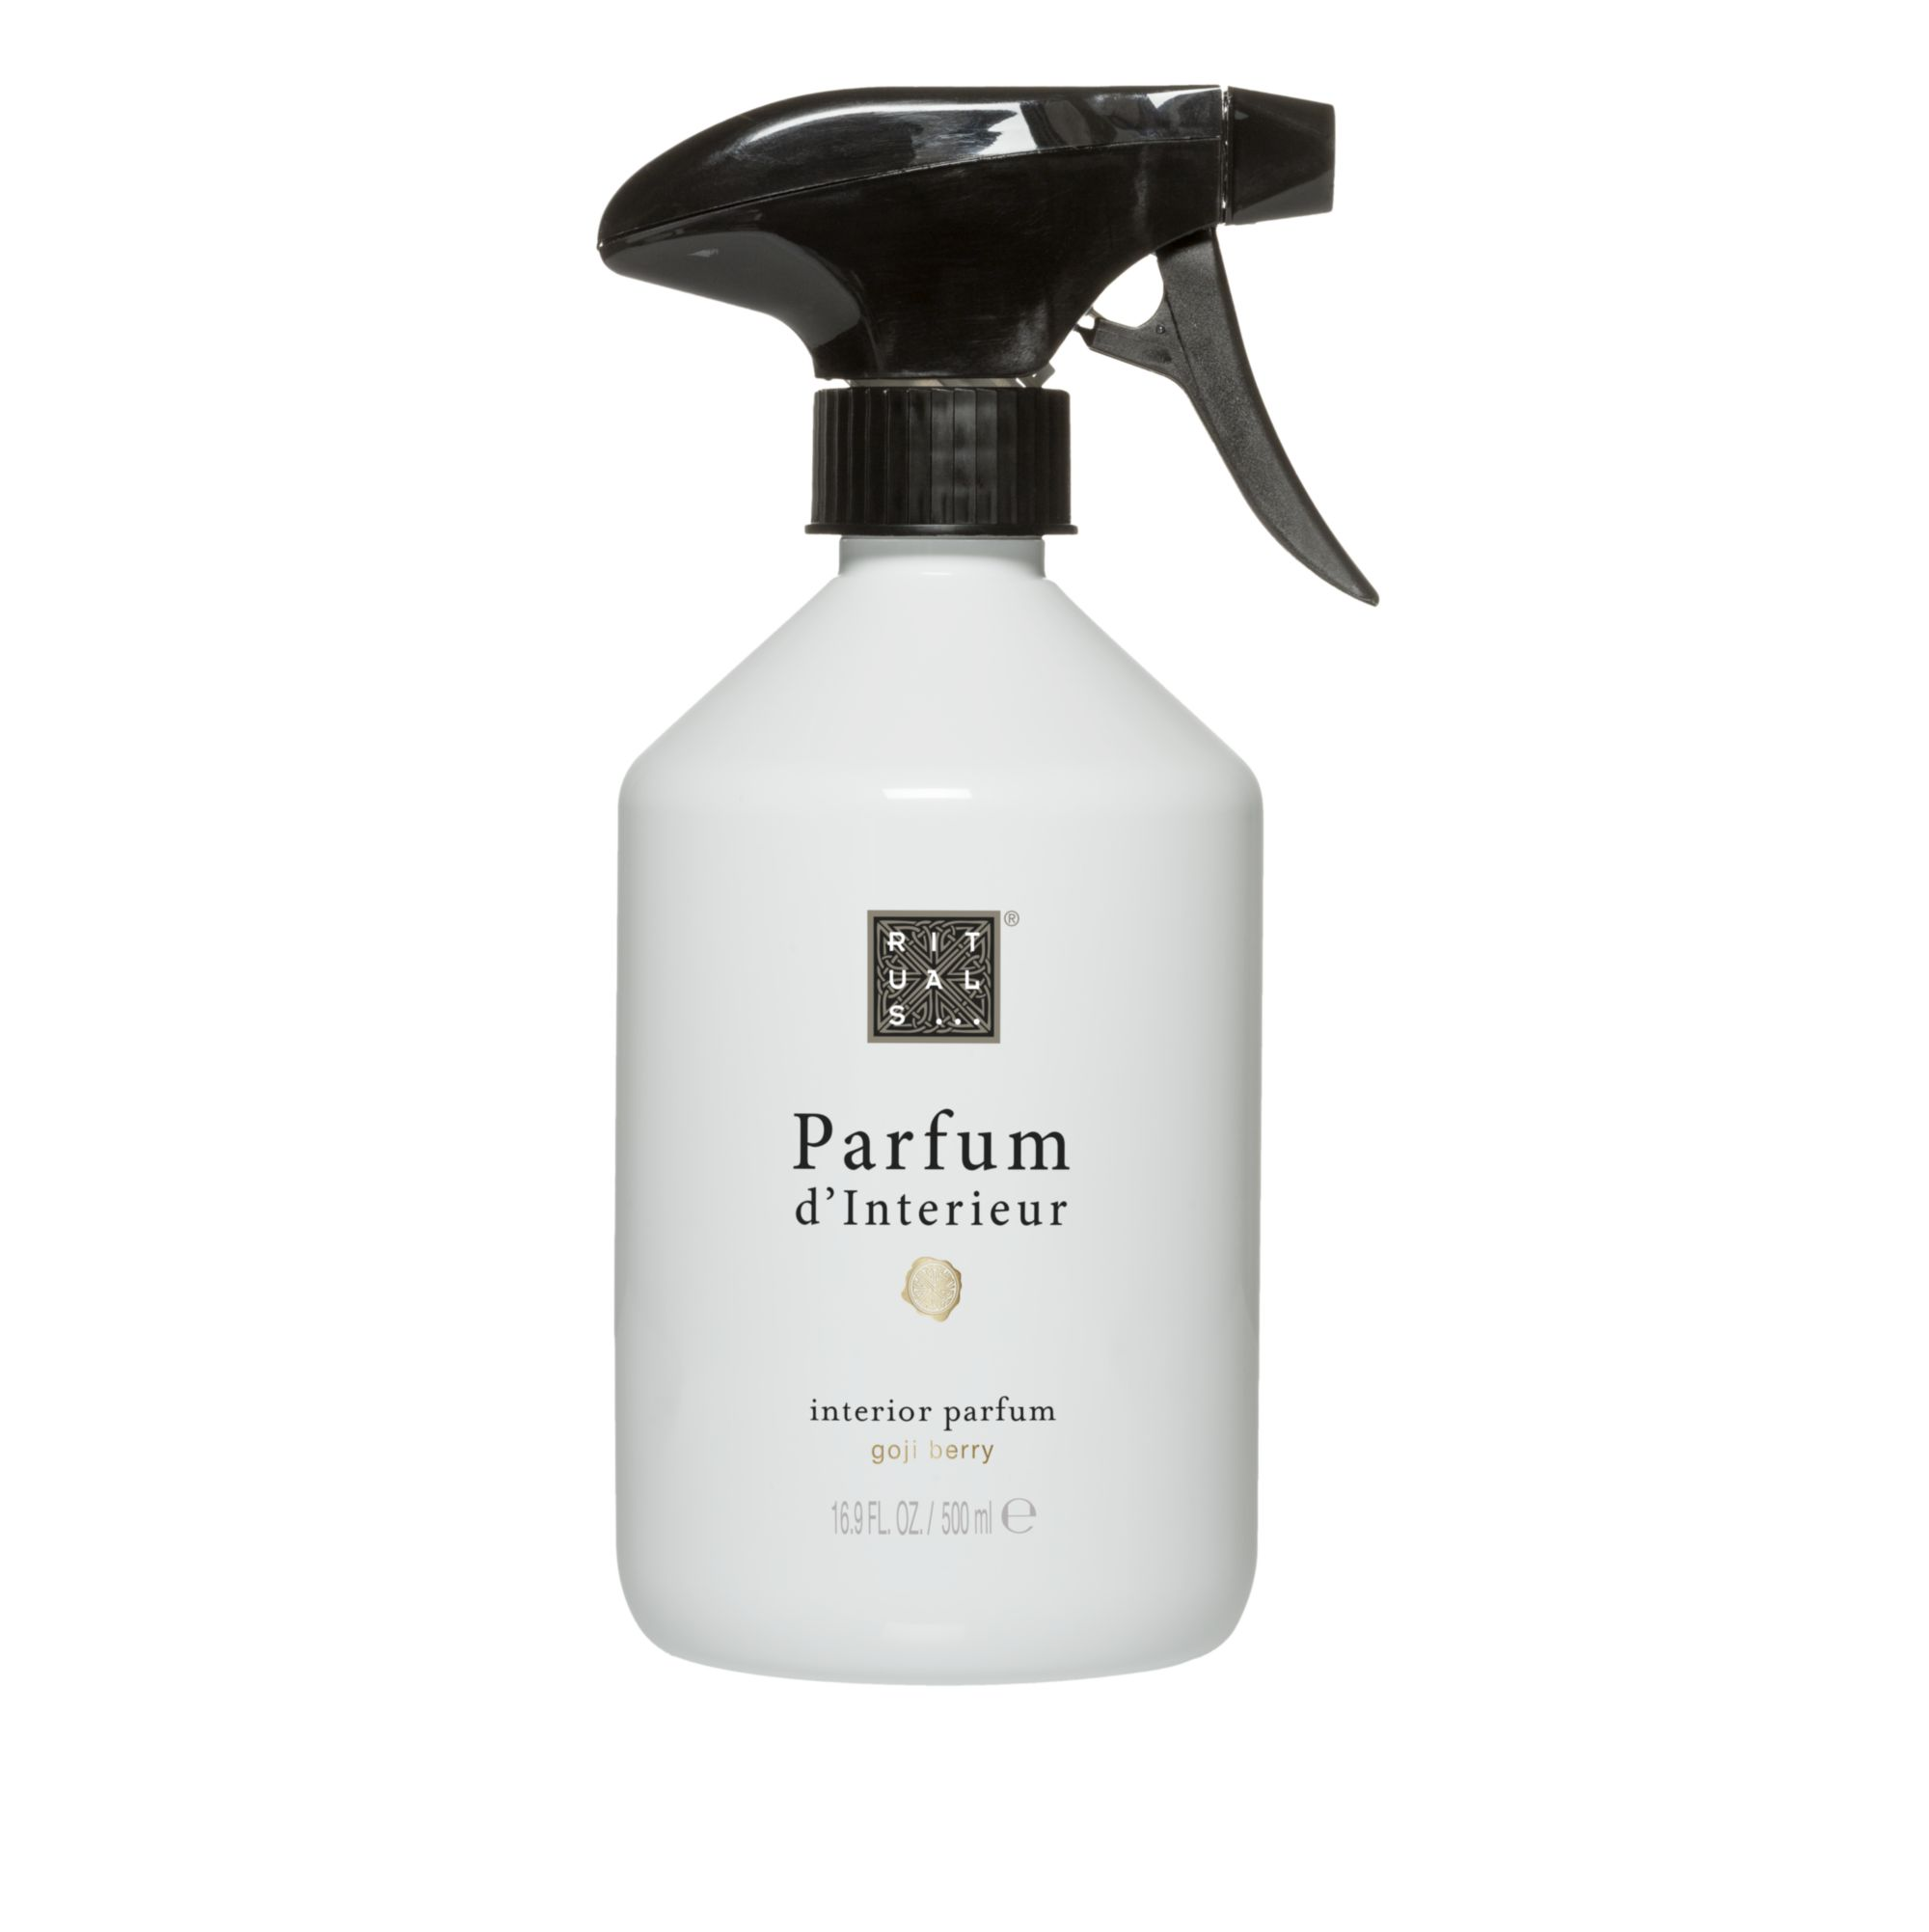 RITUALS Parfum d'Interieur Goj